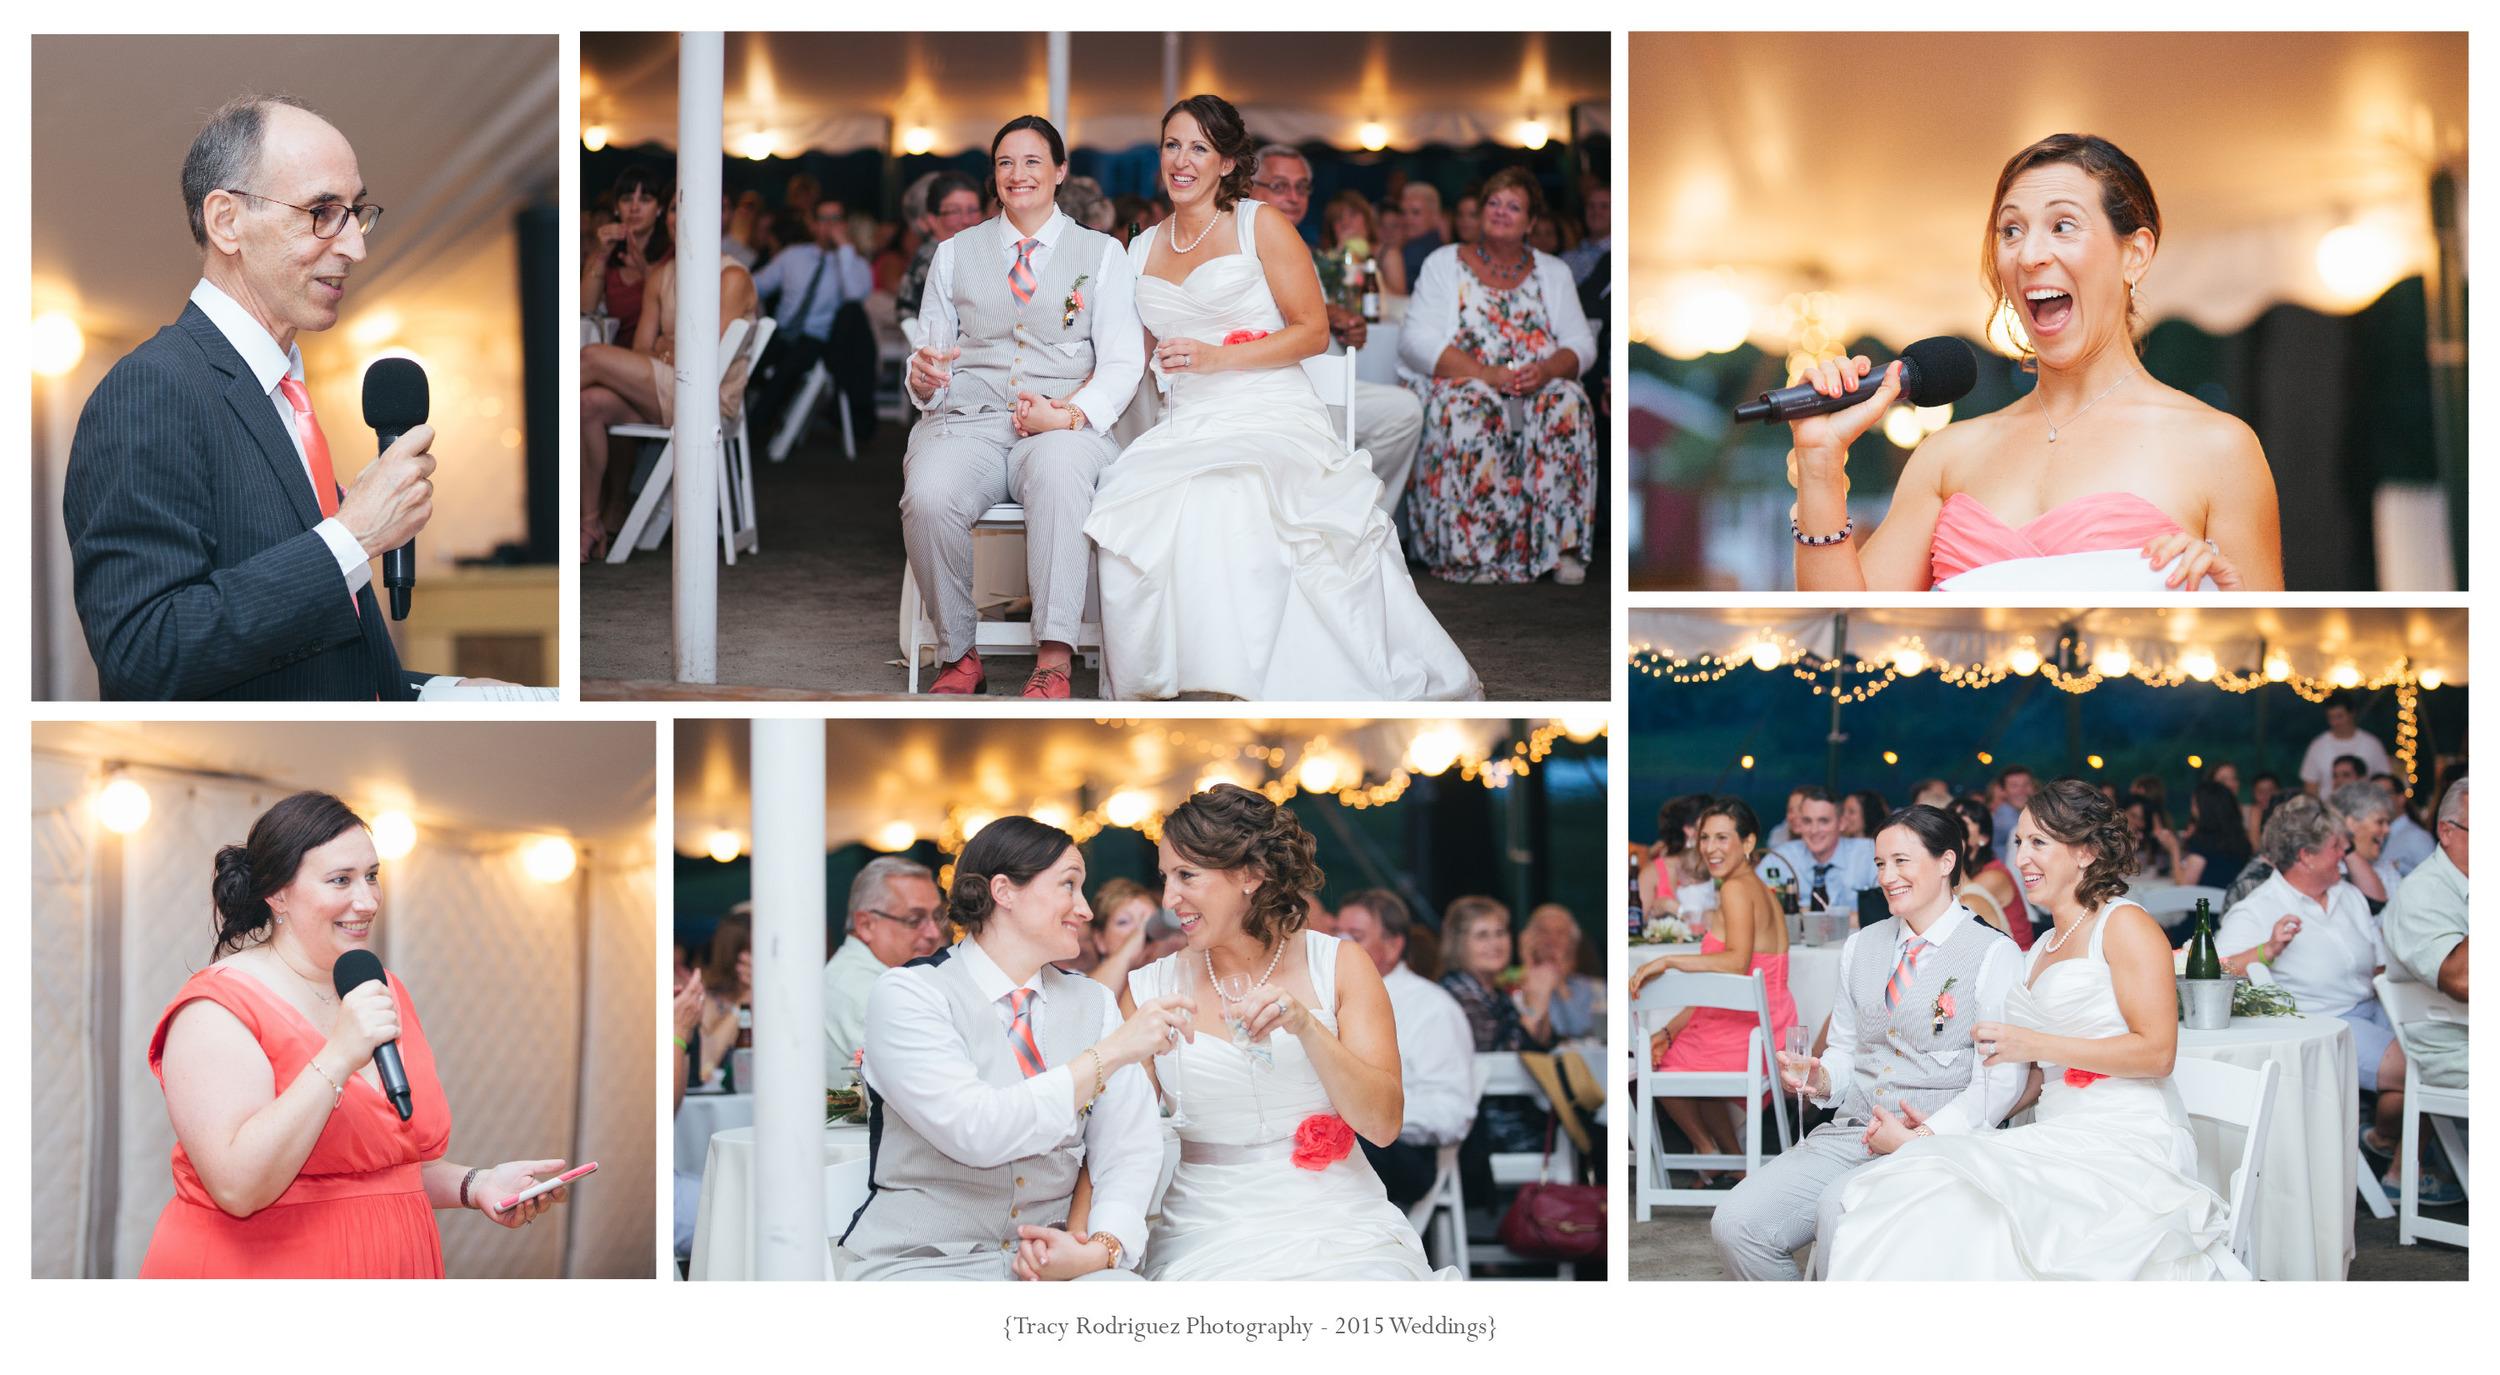 Slackberg Mock Wedding Album21.jpg